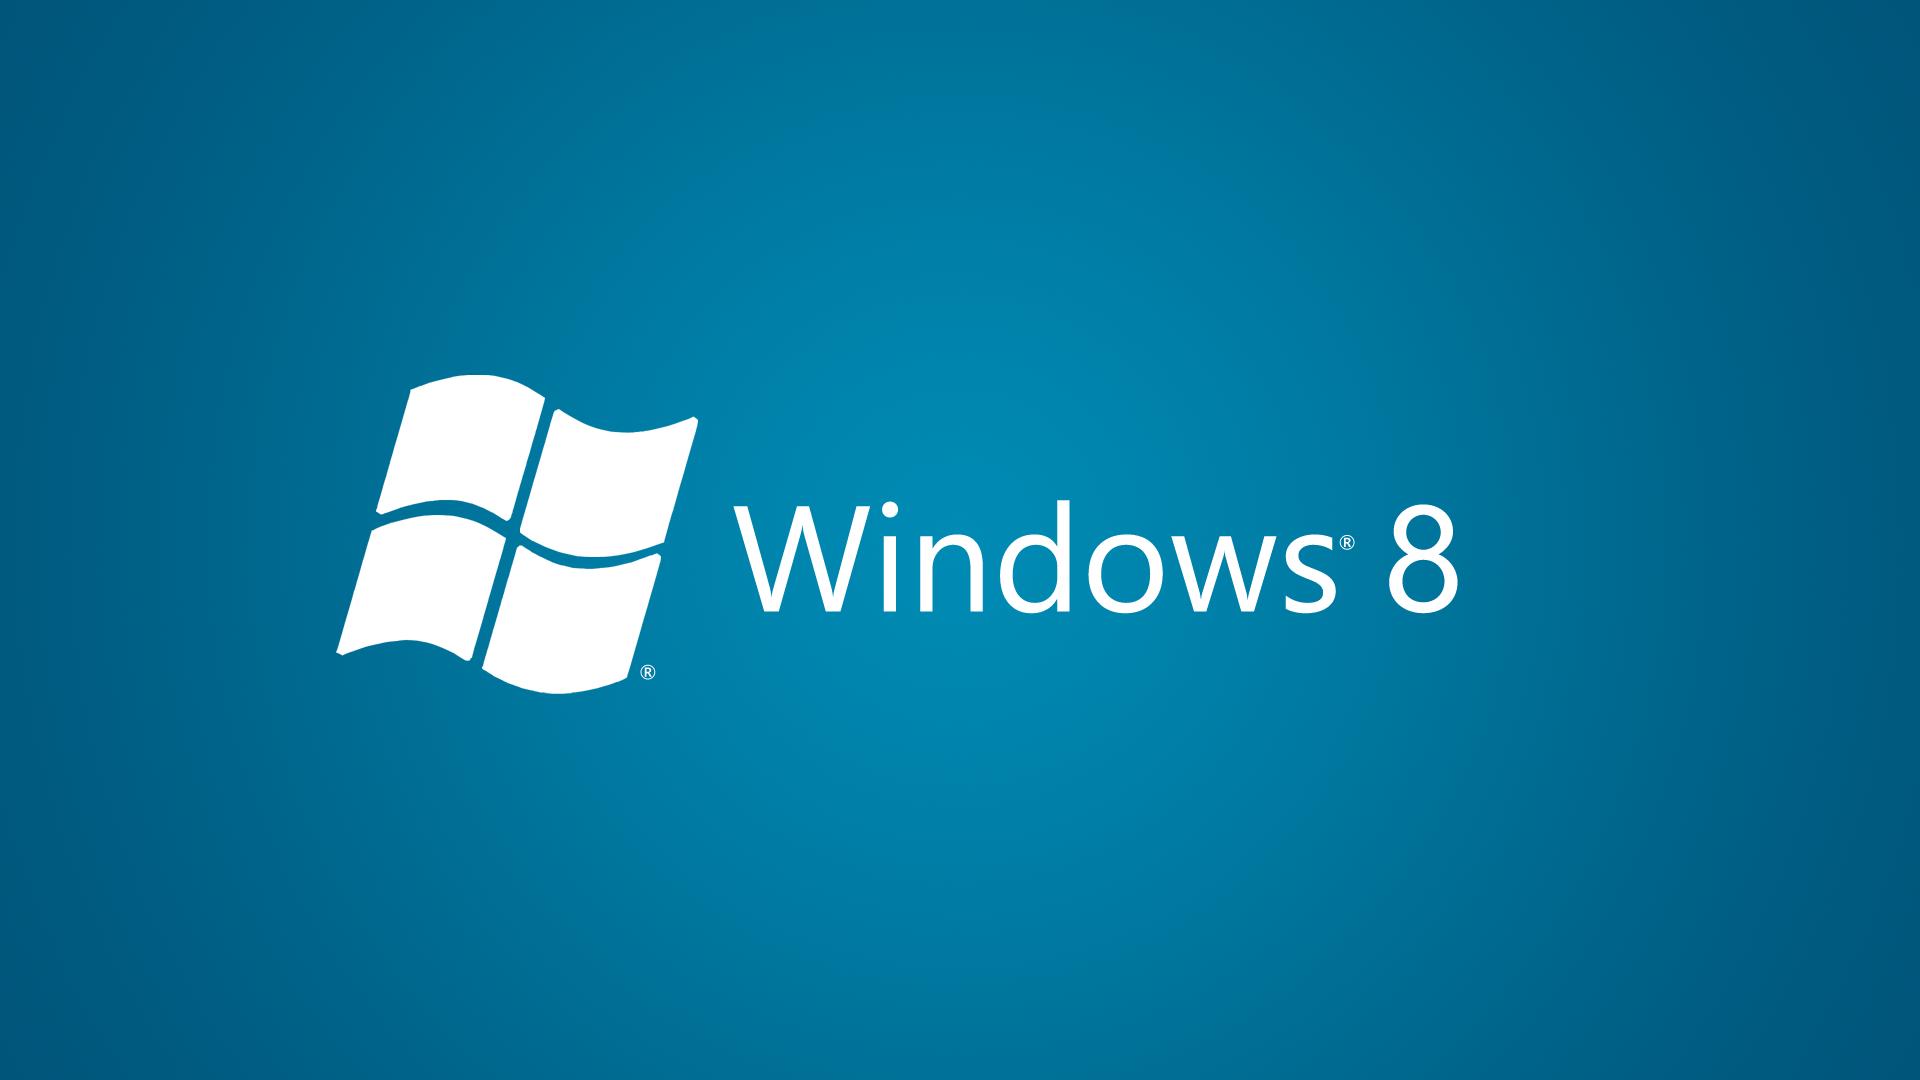 Wallpaper Windows 8  № 1929100 загрузить